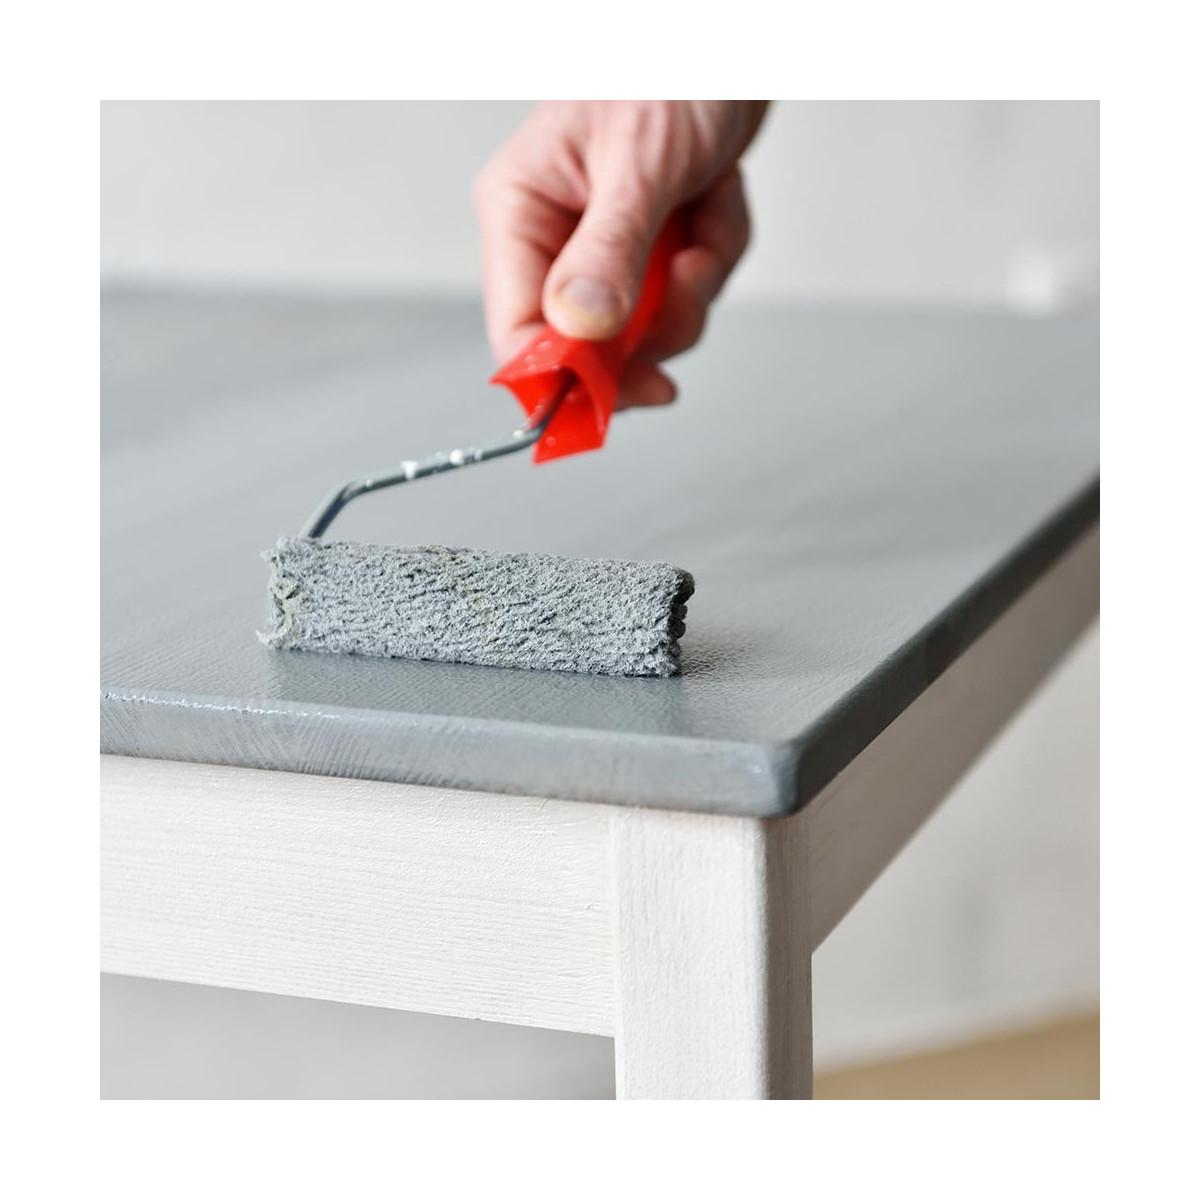 Peinture meuble cuisine bois stratifi m lamin radiateur porte r sine - Peinture meuble cuisine stratifie ...